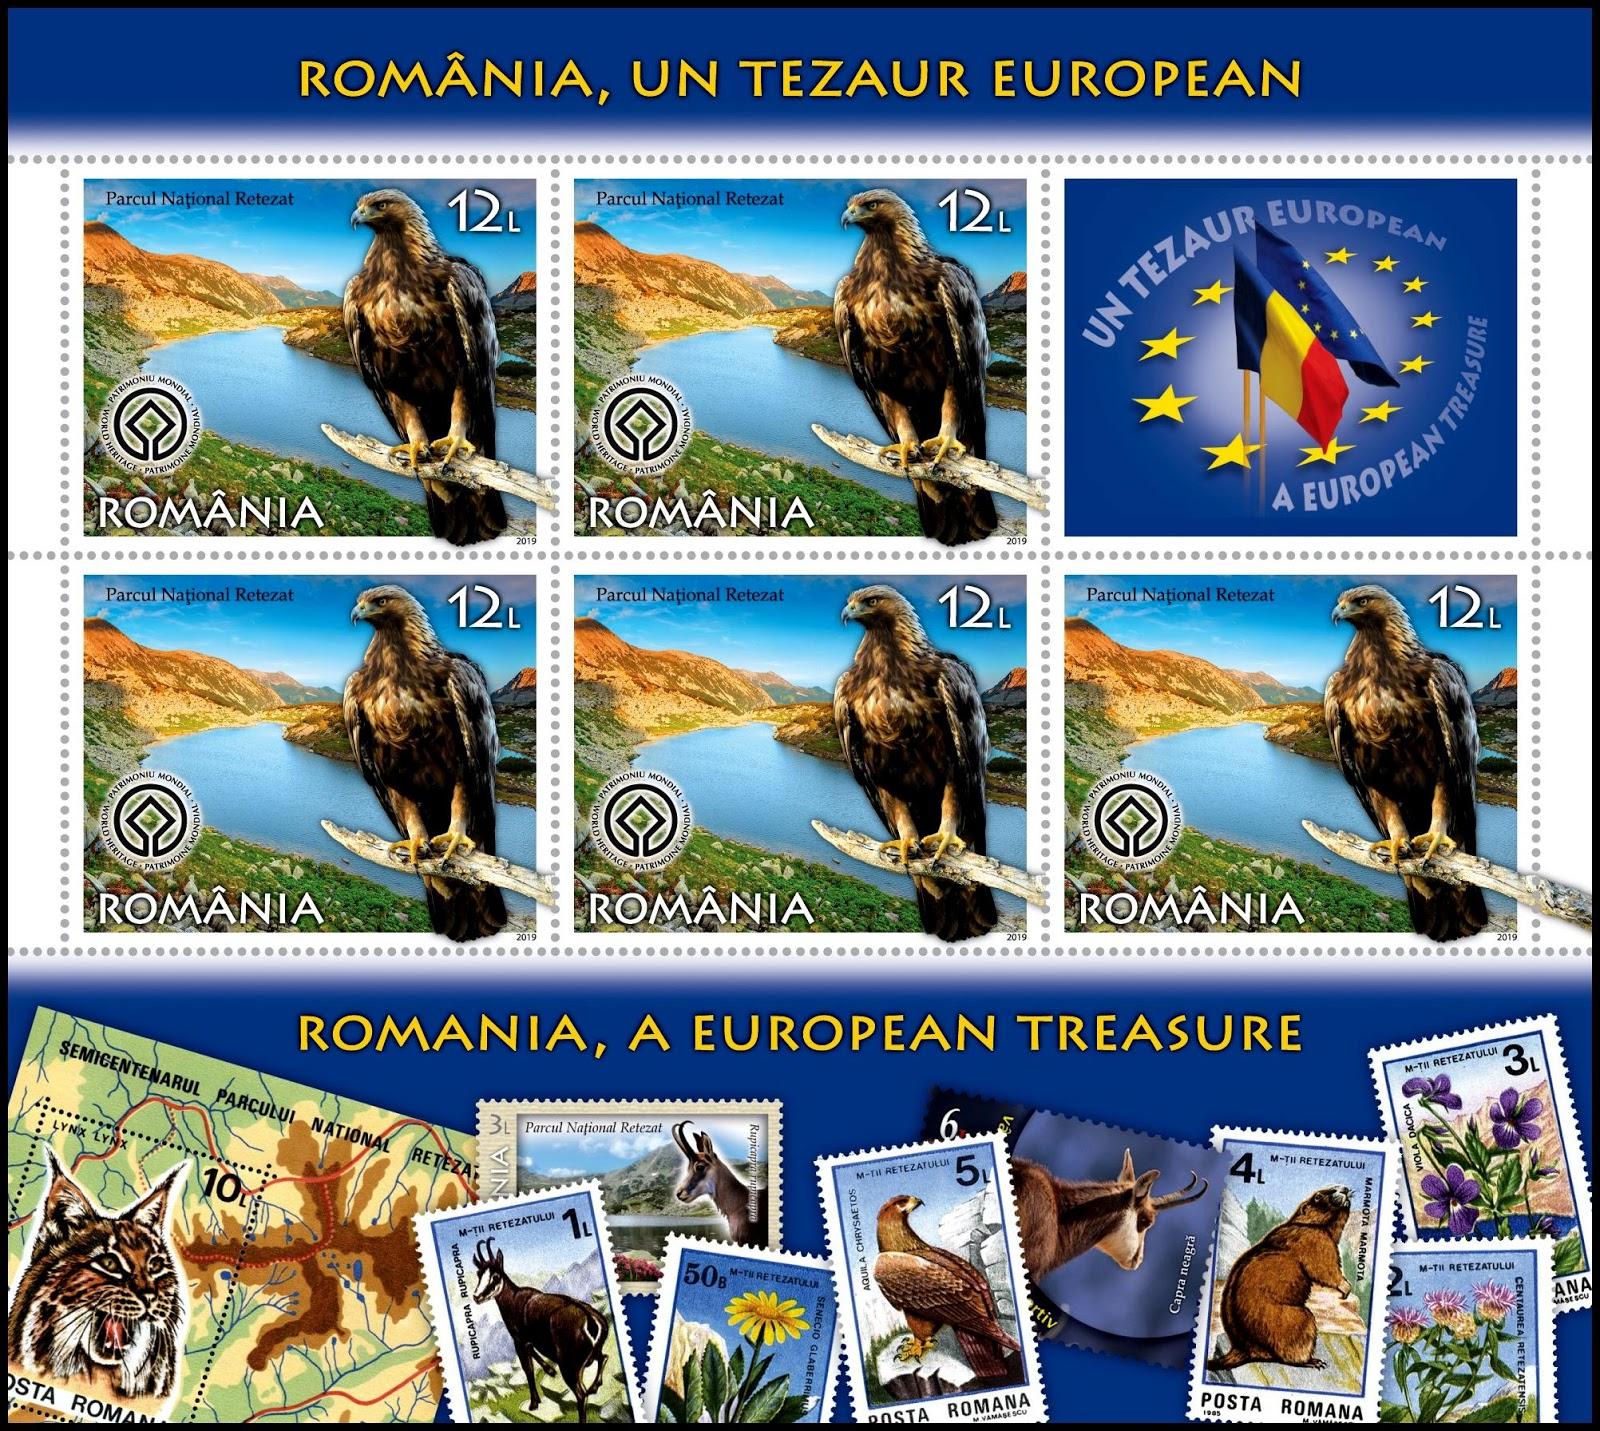 Romania - A National Treasure (January 16, 2019) design #6 sheet of 5 + label